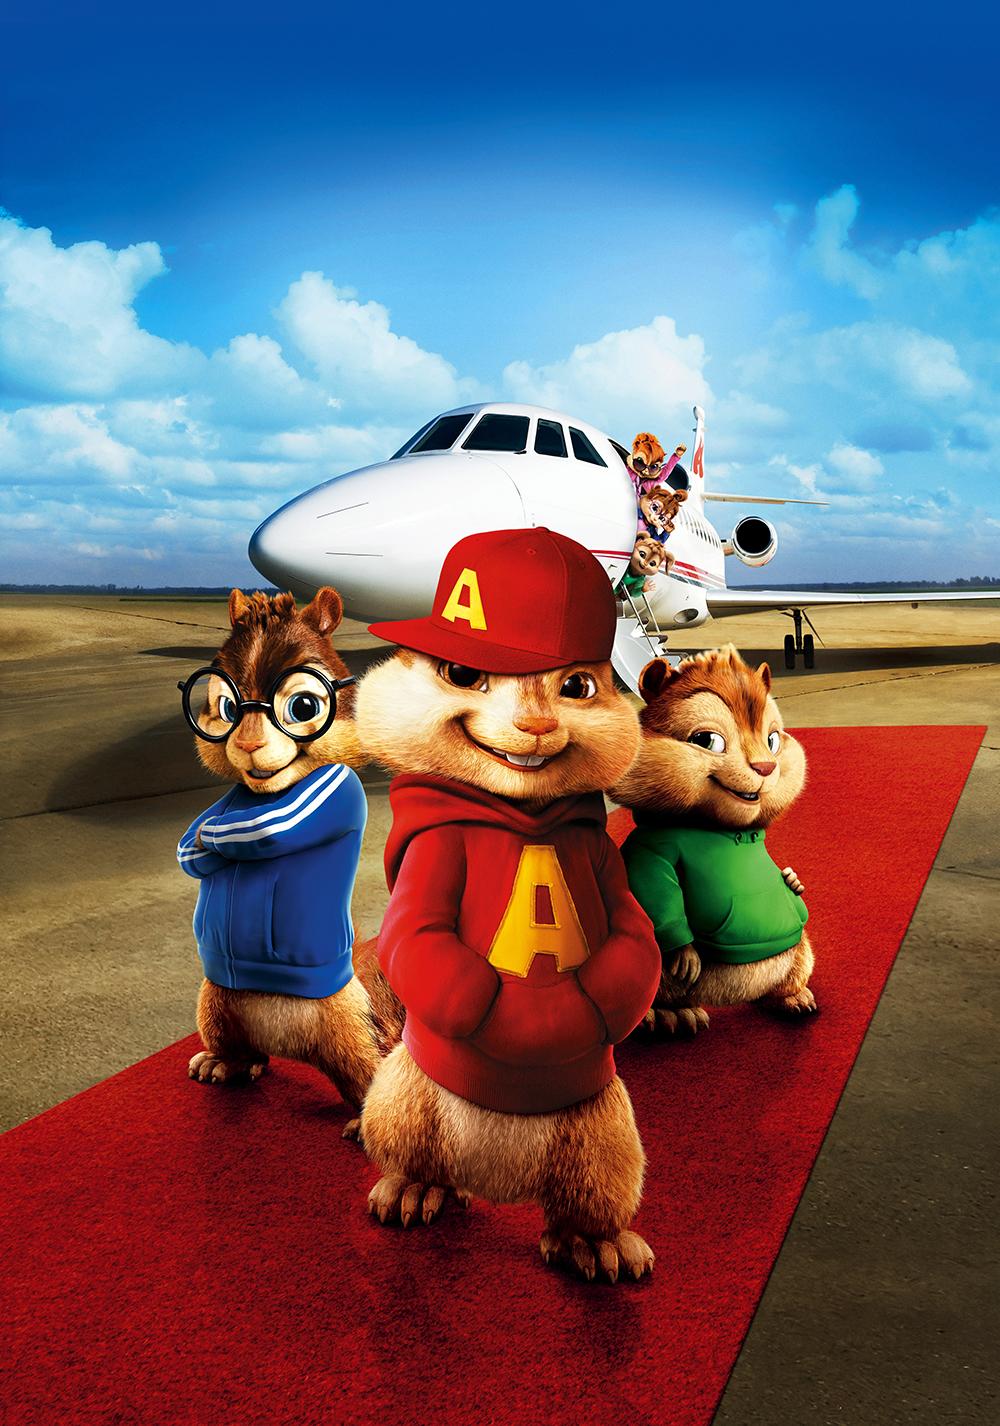 Alvin And The Chipmunks The Squeakquel Movie Fanart Fanart Tv